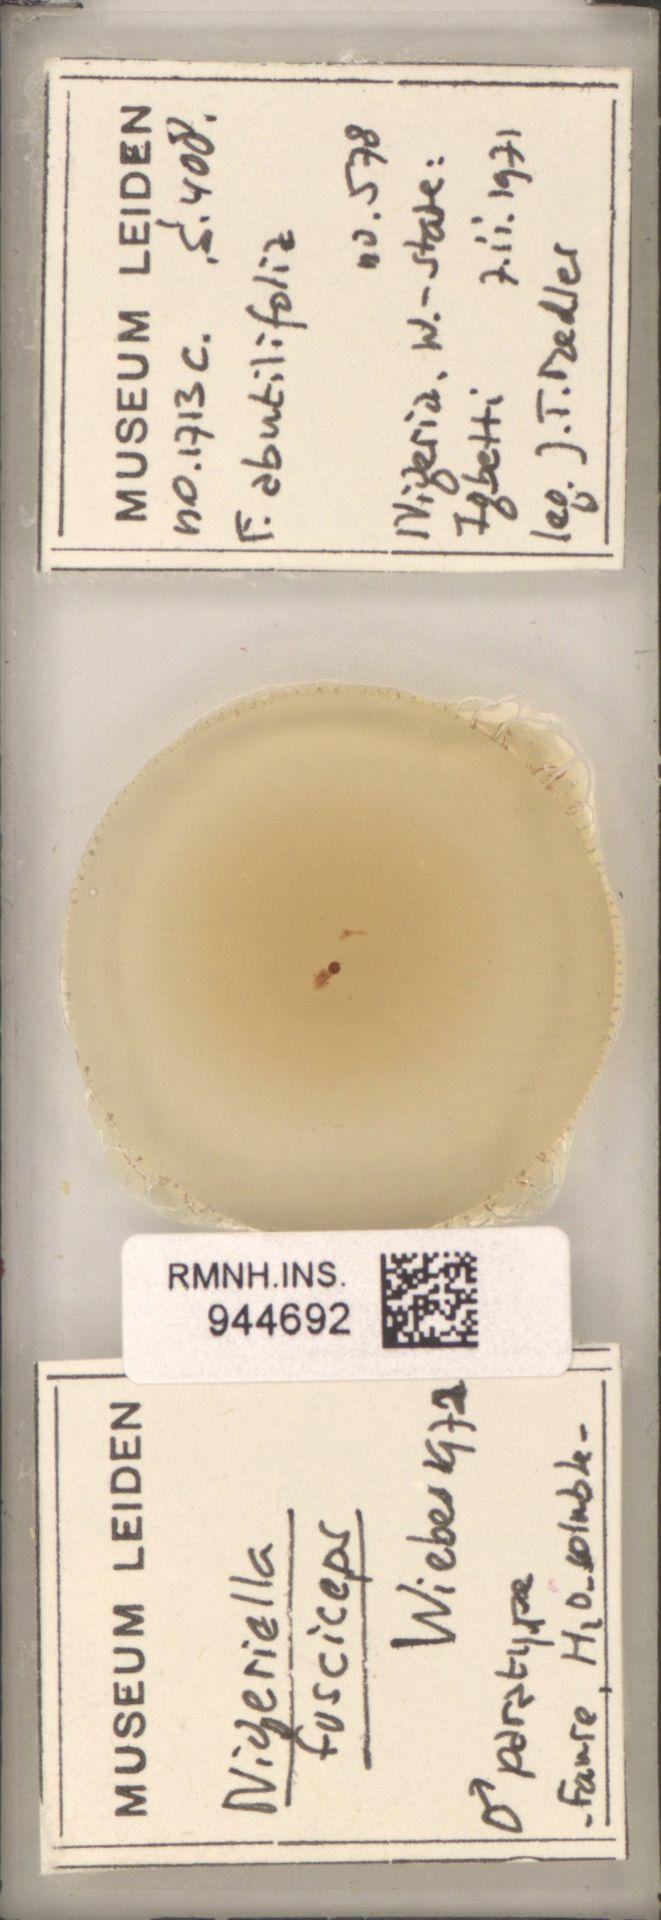 RMNH.INS.944692 | Nigeriella fusciceps Wiebes, 1972